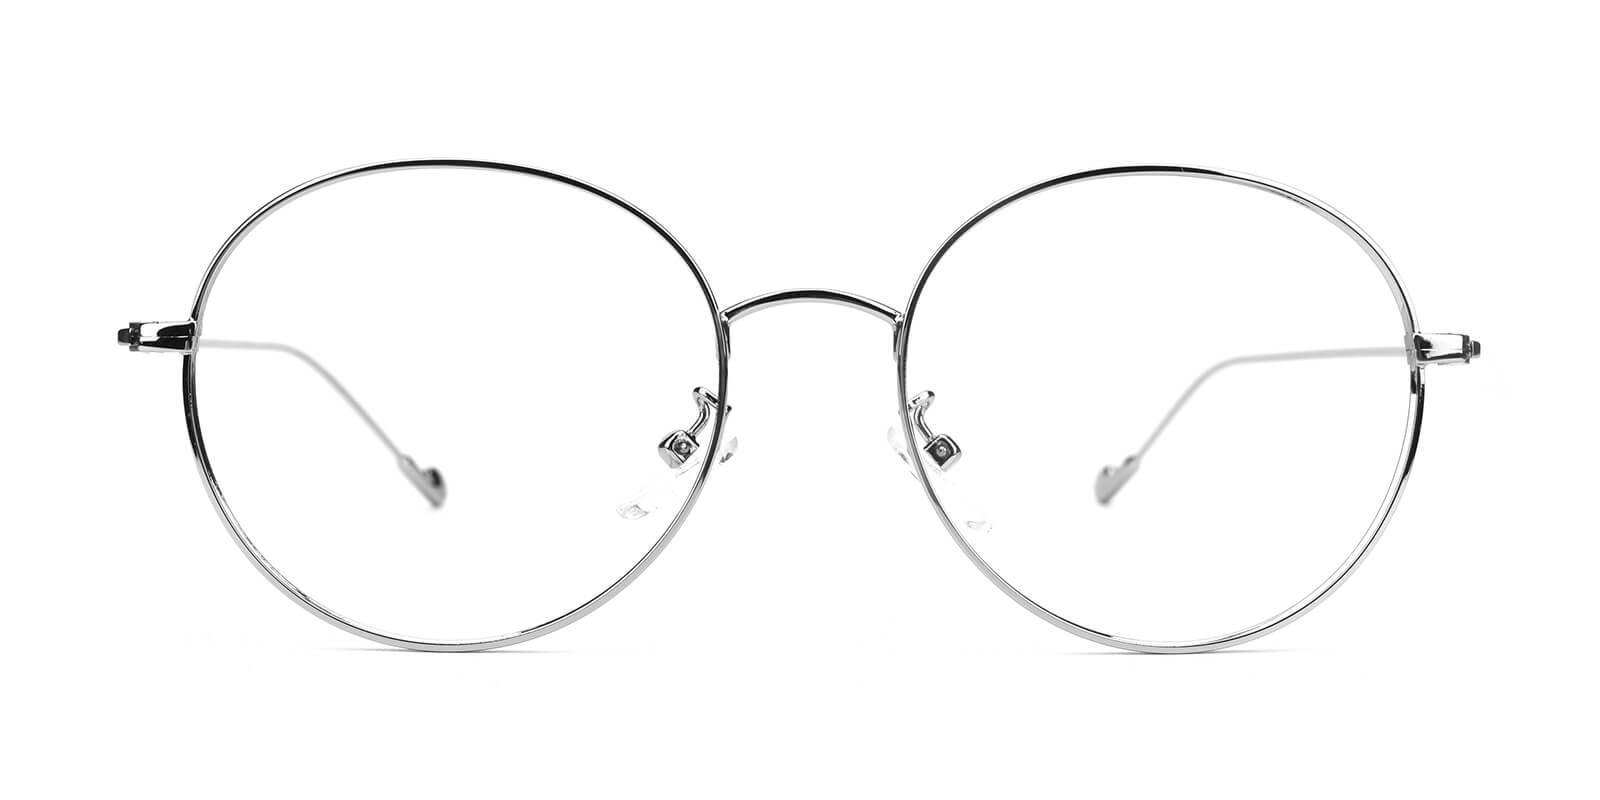 Jessy-Silver-Round-Metal-Eyeglasses-additional2